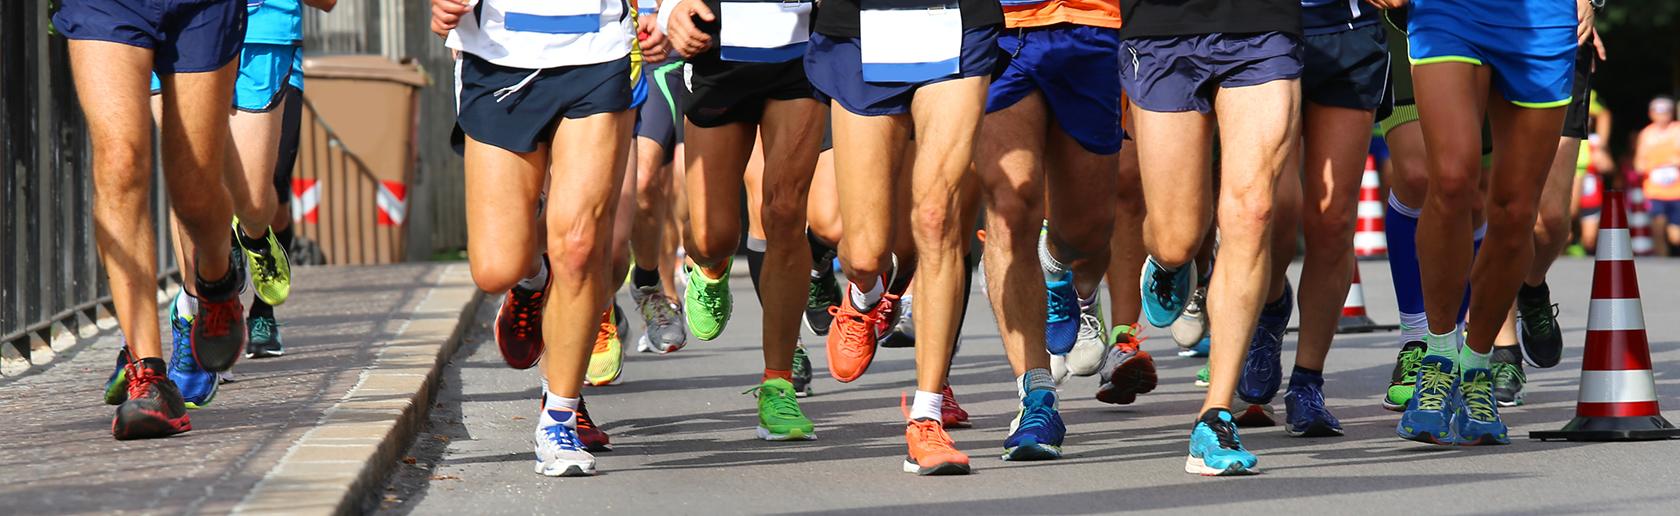 mantione-runners.jpg